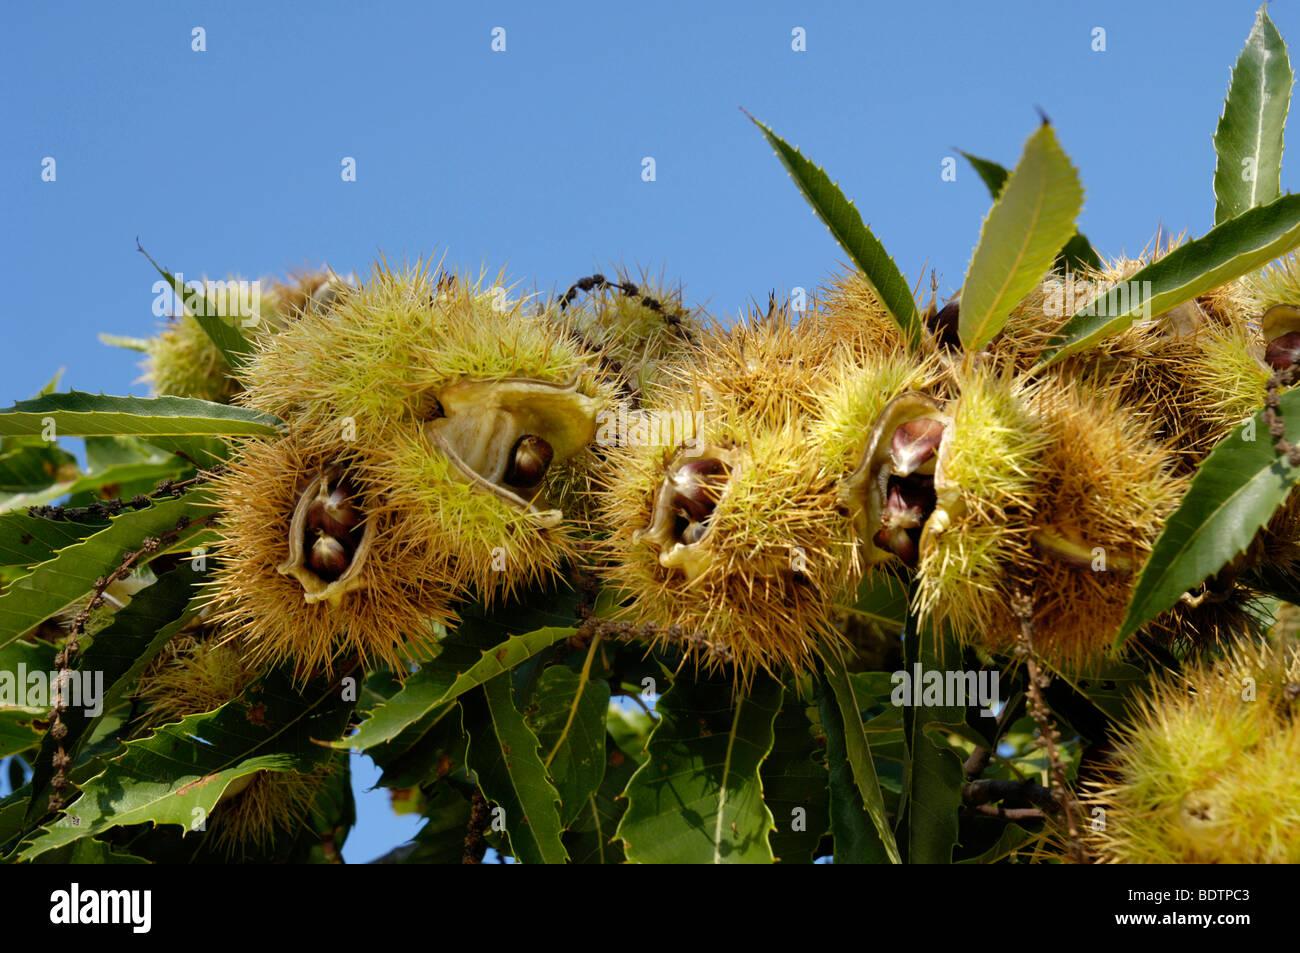 Frutos de castañas, Castanea sativa, Maroni, Esskastanienfruechte, Maronen, Kastanie Kastanien Foto de stock